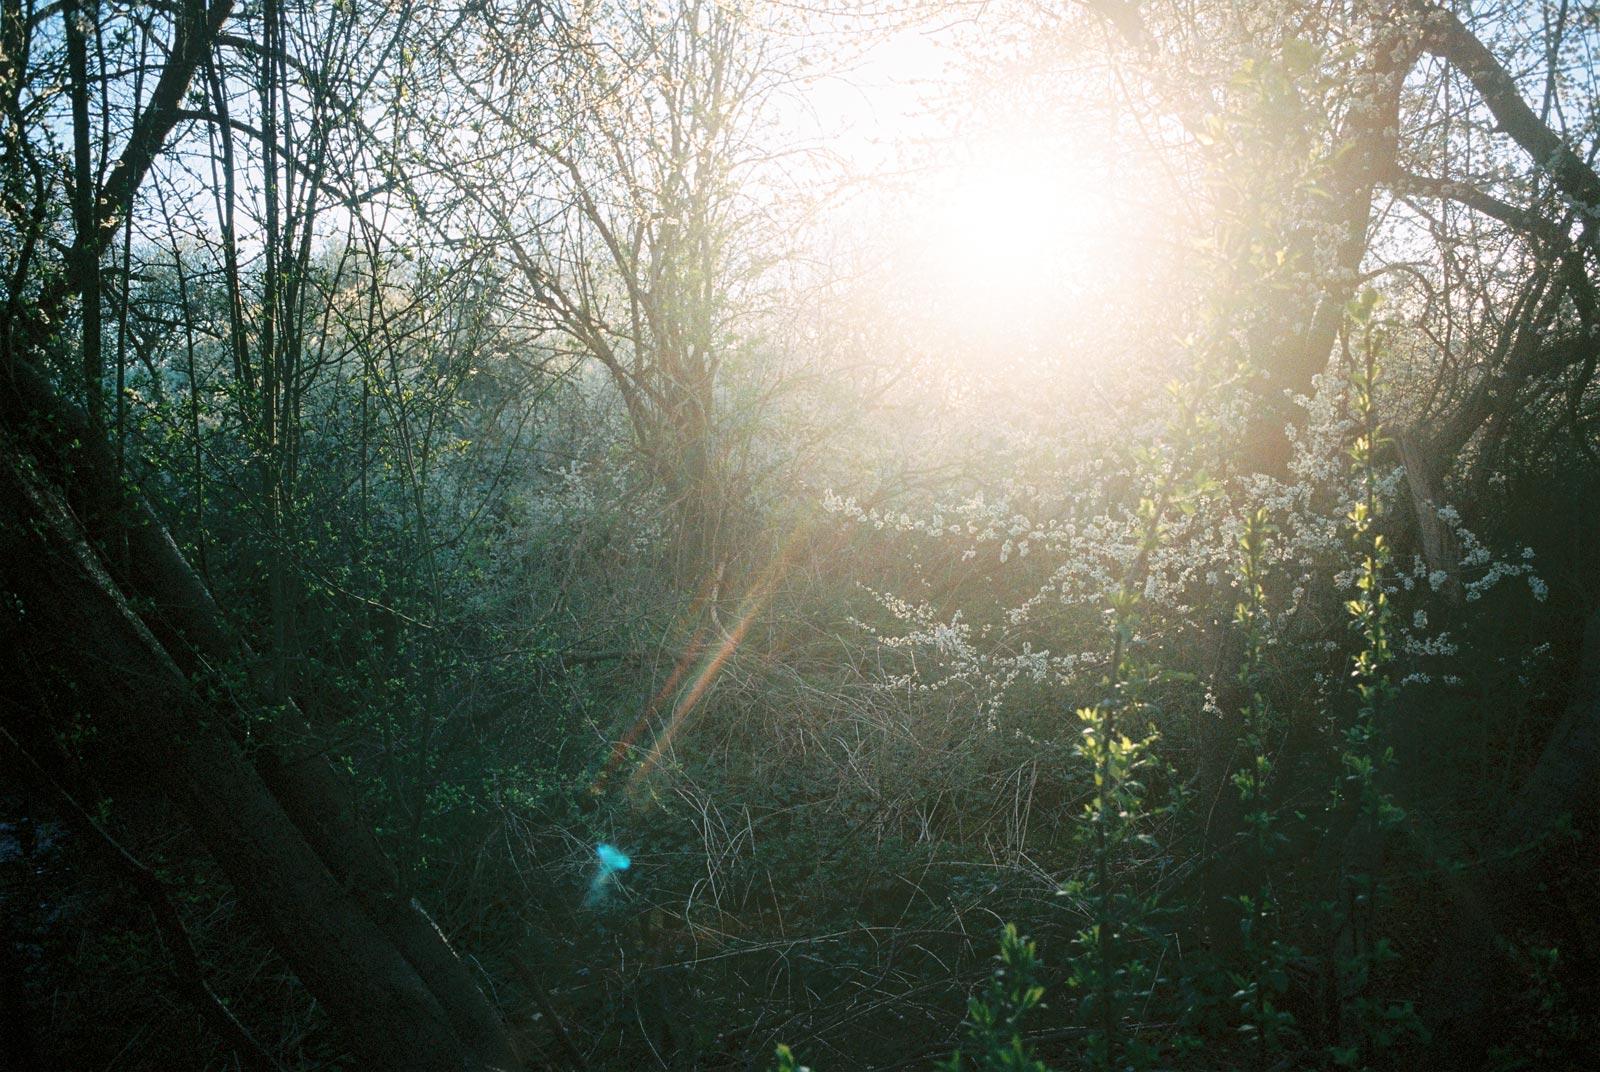 Photography by Ian Watts